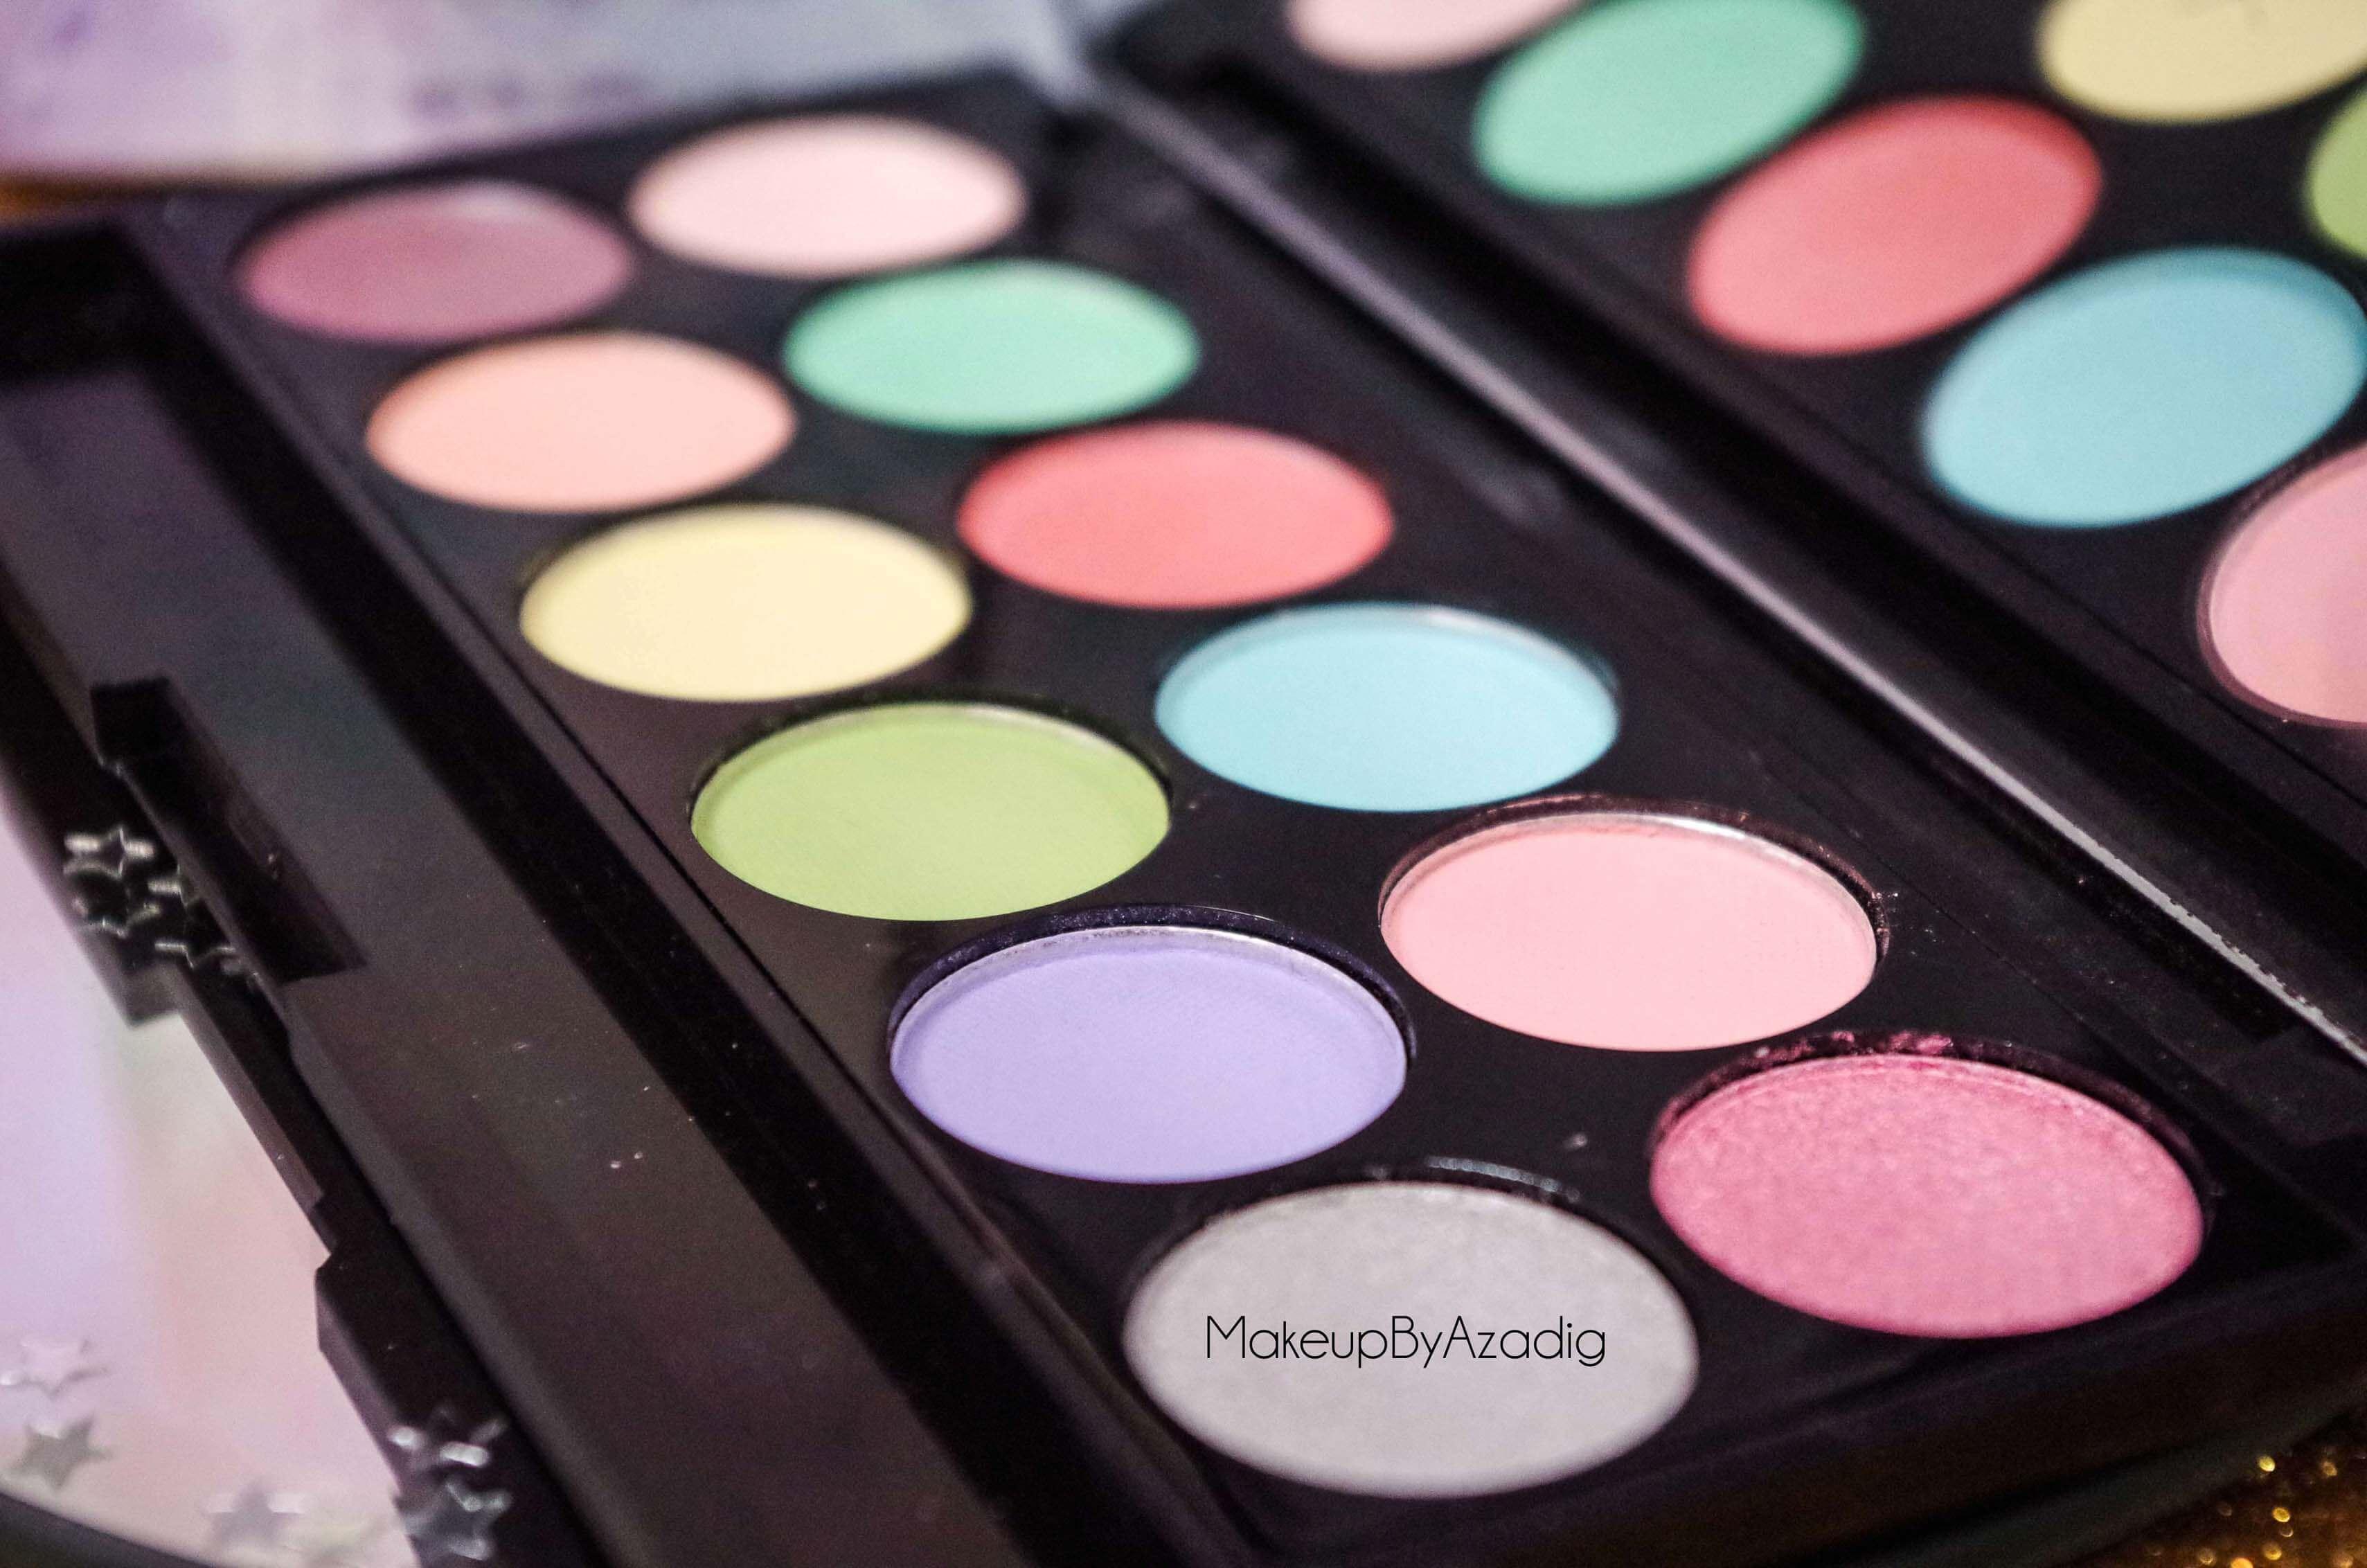 review-palette-sleek-makeup-idivine-pas-cher-sephora-couleurs-allthefunofthefair-code-promo-sephora-paris-makeupbyazadig-zoom-2